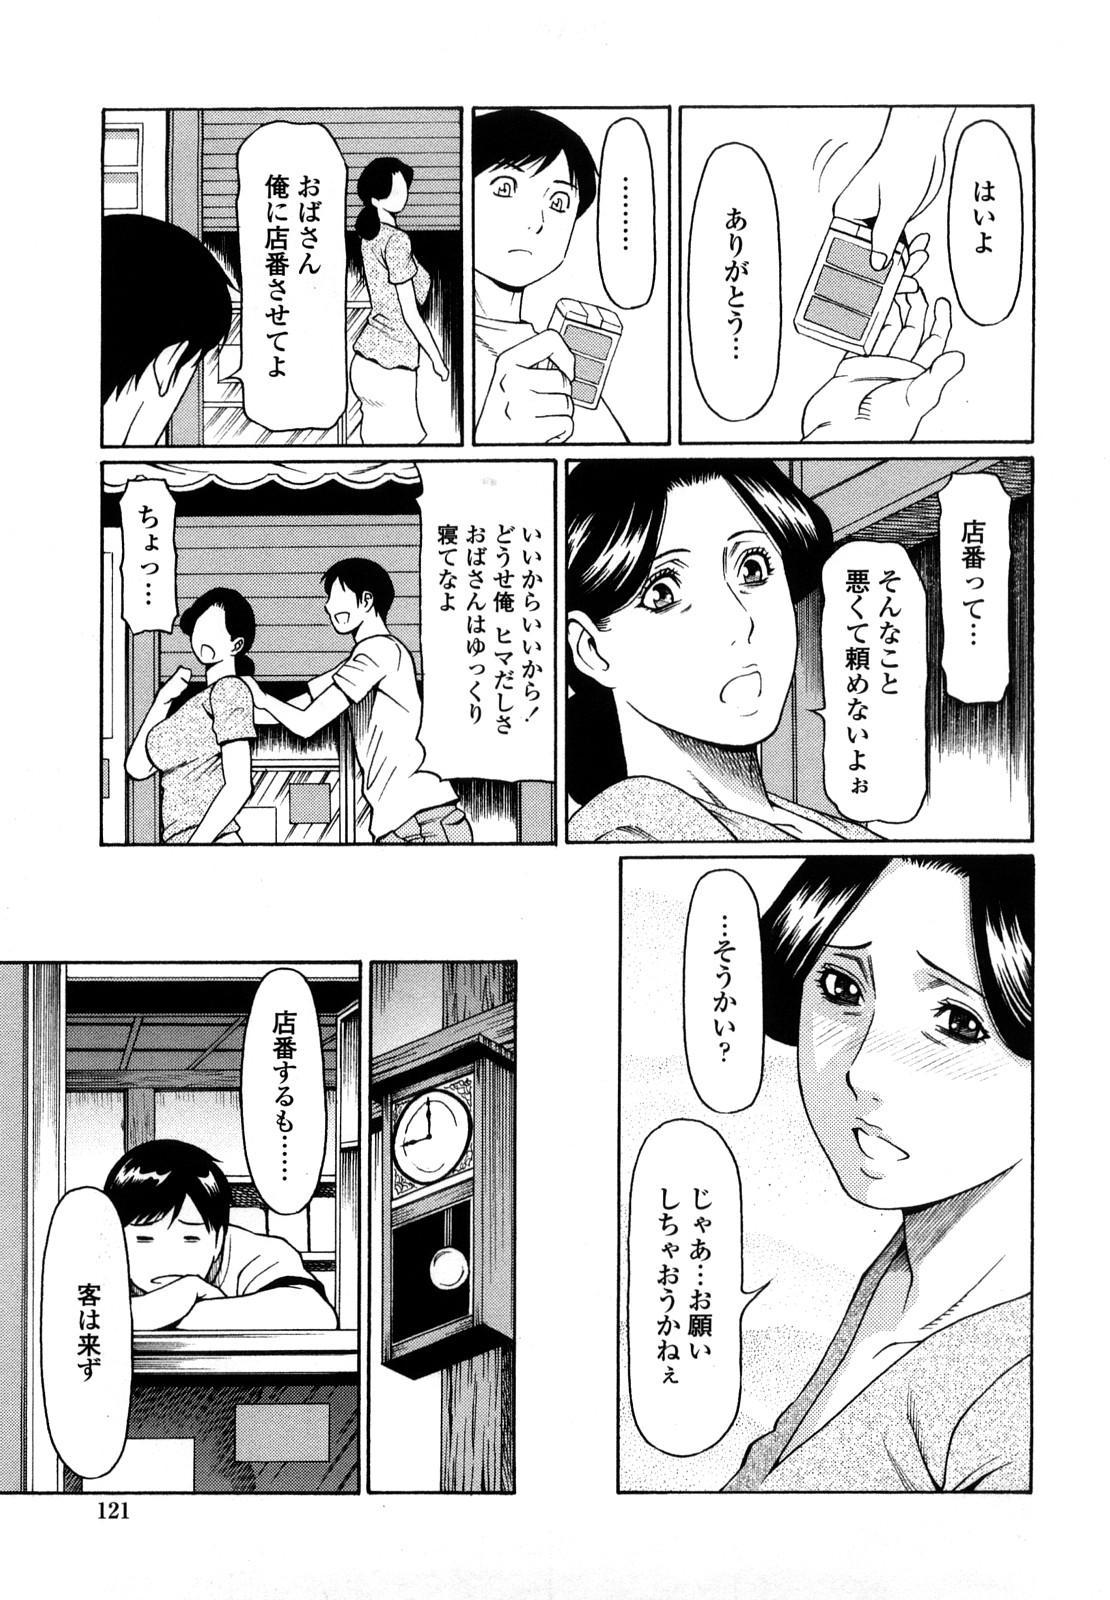 [Takasugi Kou] Kindan no Haha-Ana - Immorality Love-Hole [Decensored] 122